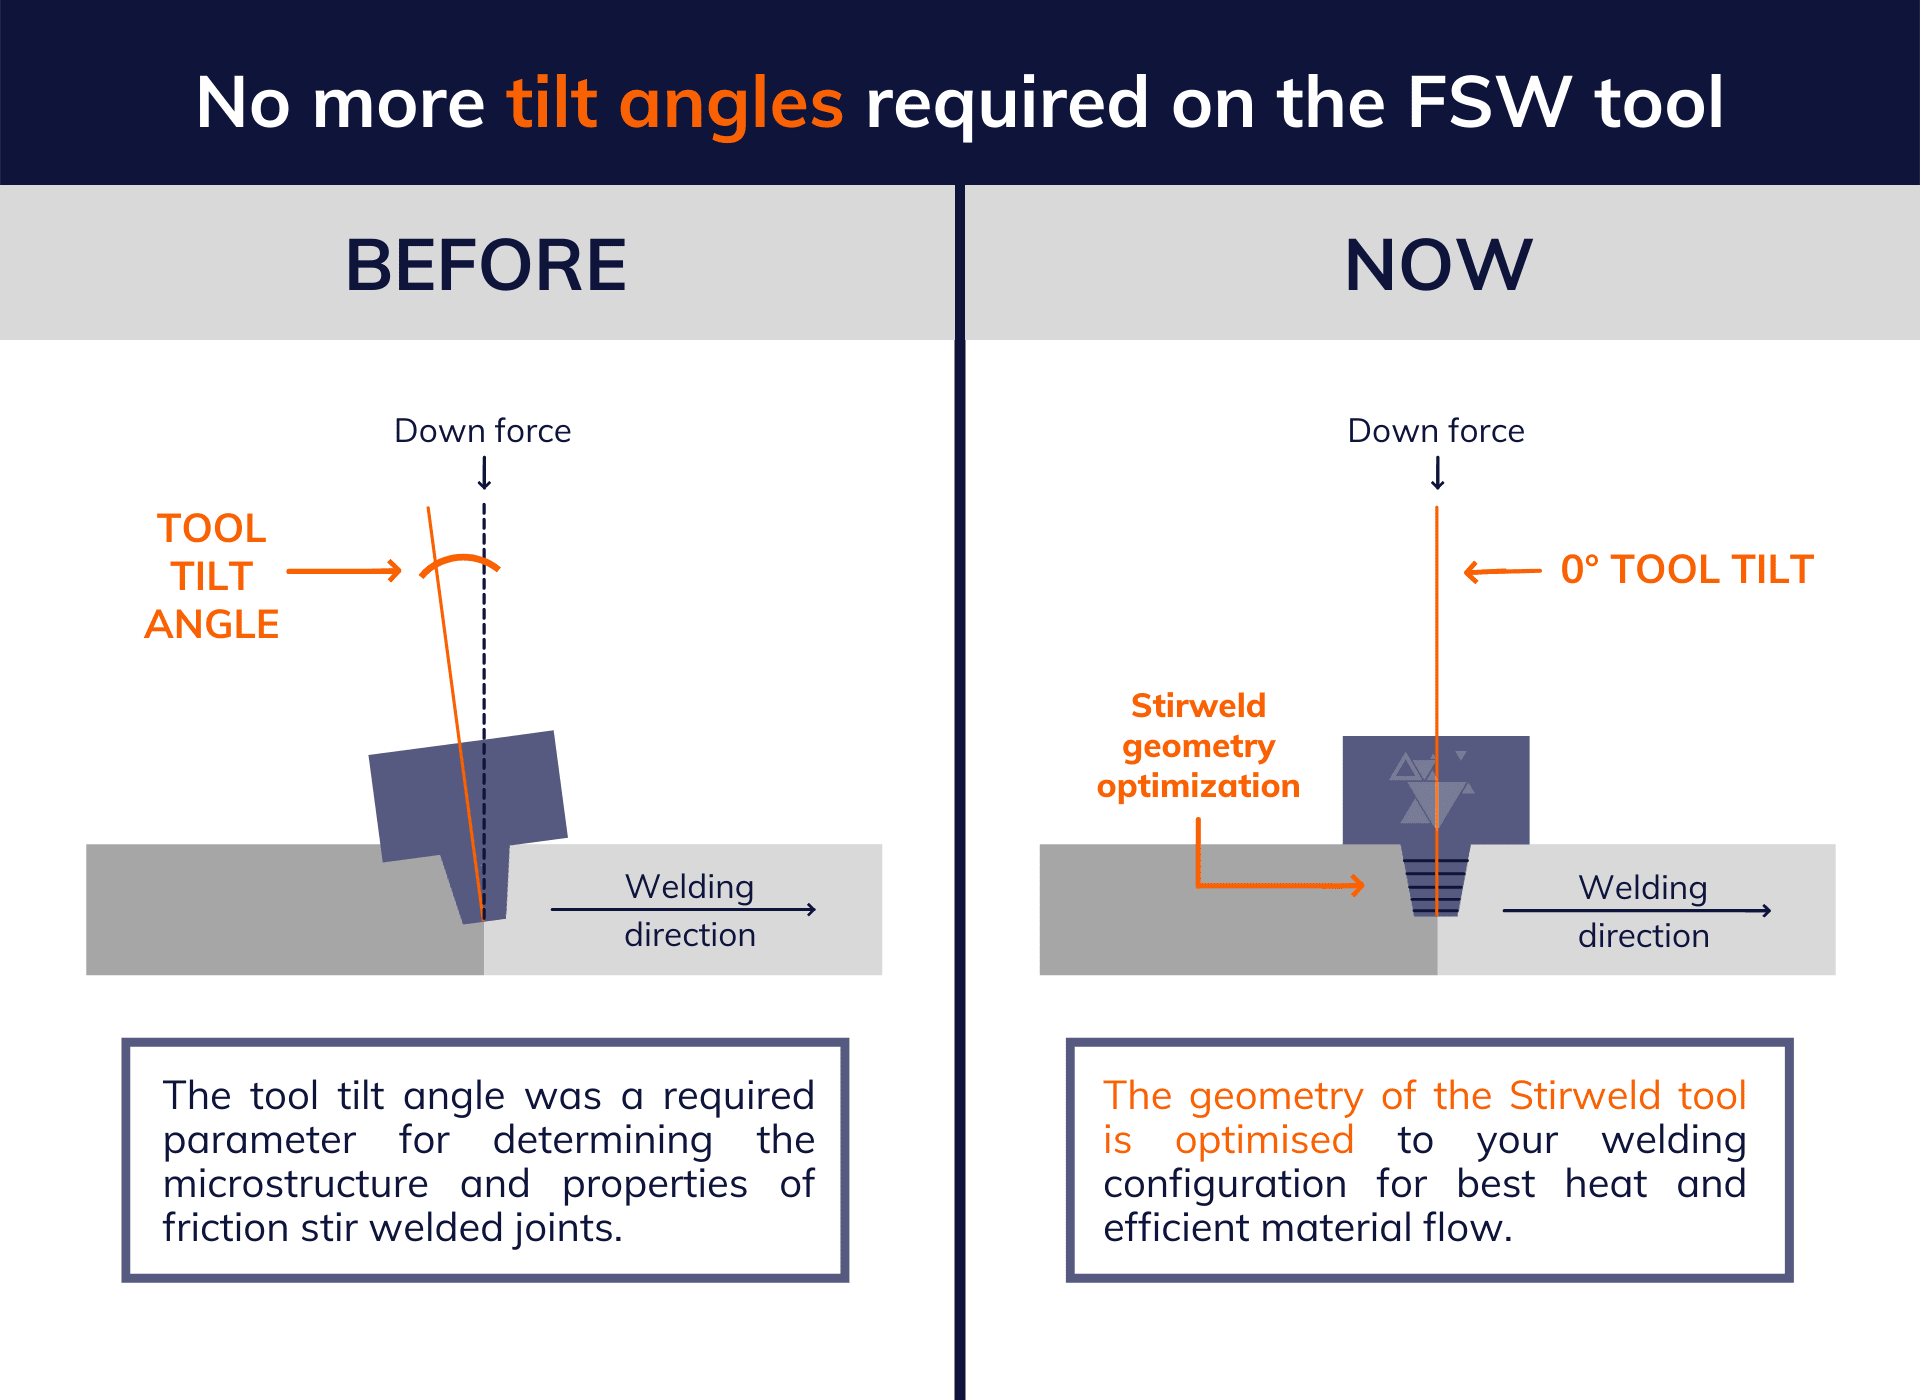 Soudage par friction malaxage: Tilt angle